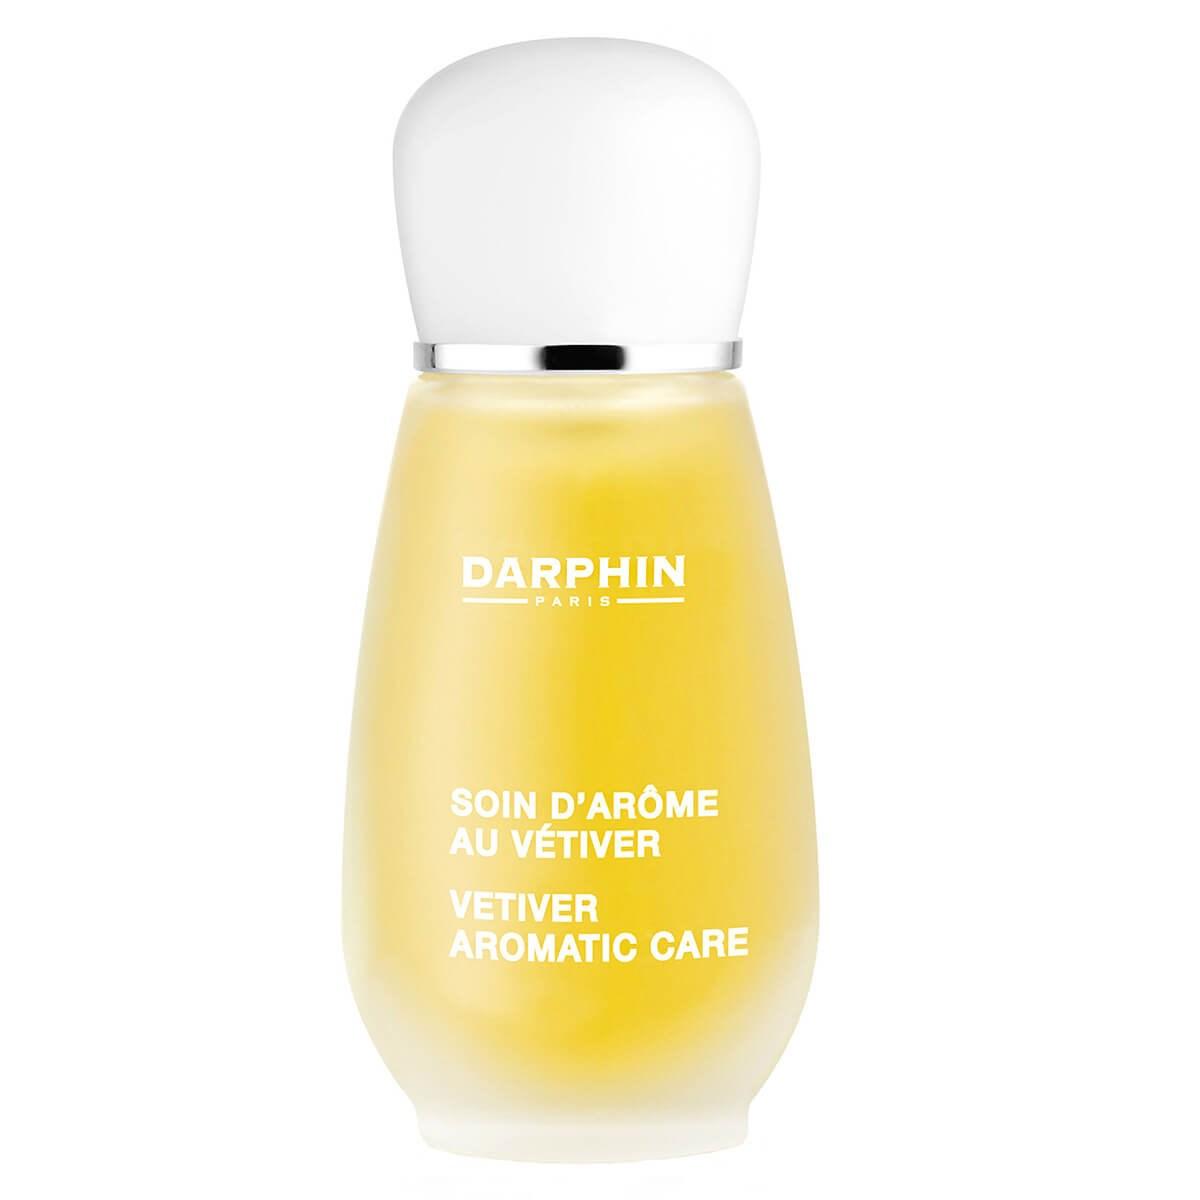 Darphin Vetiver Aromatic Care Stress Relief Detox